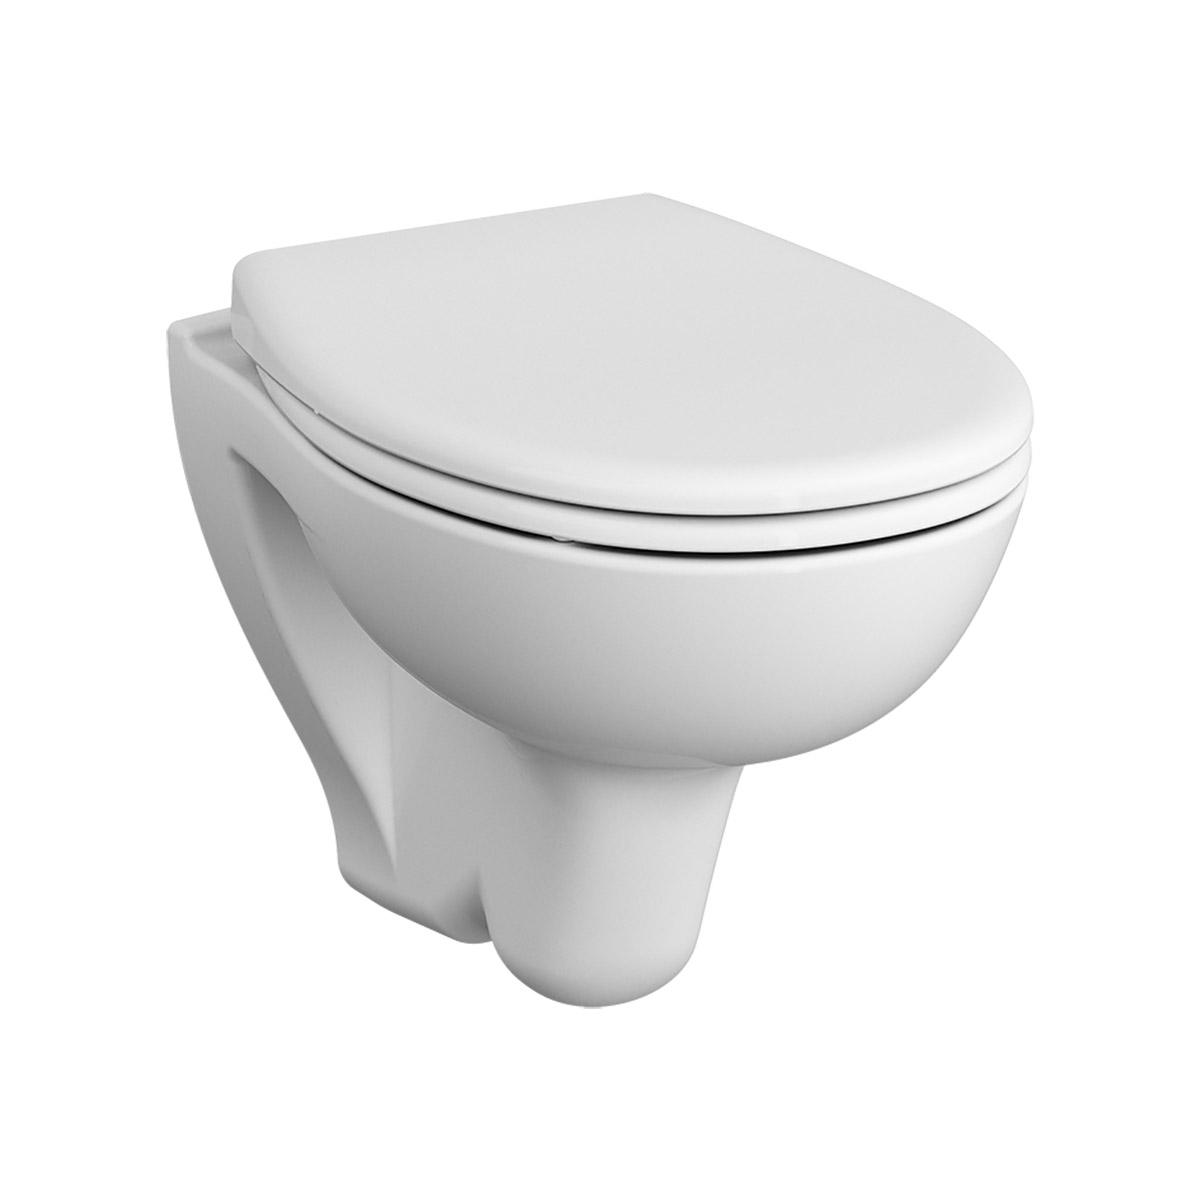 S20 Wand-WC Compact, Universal Shape